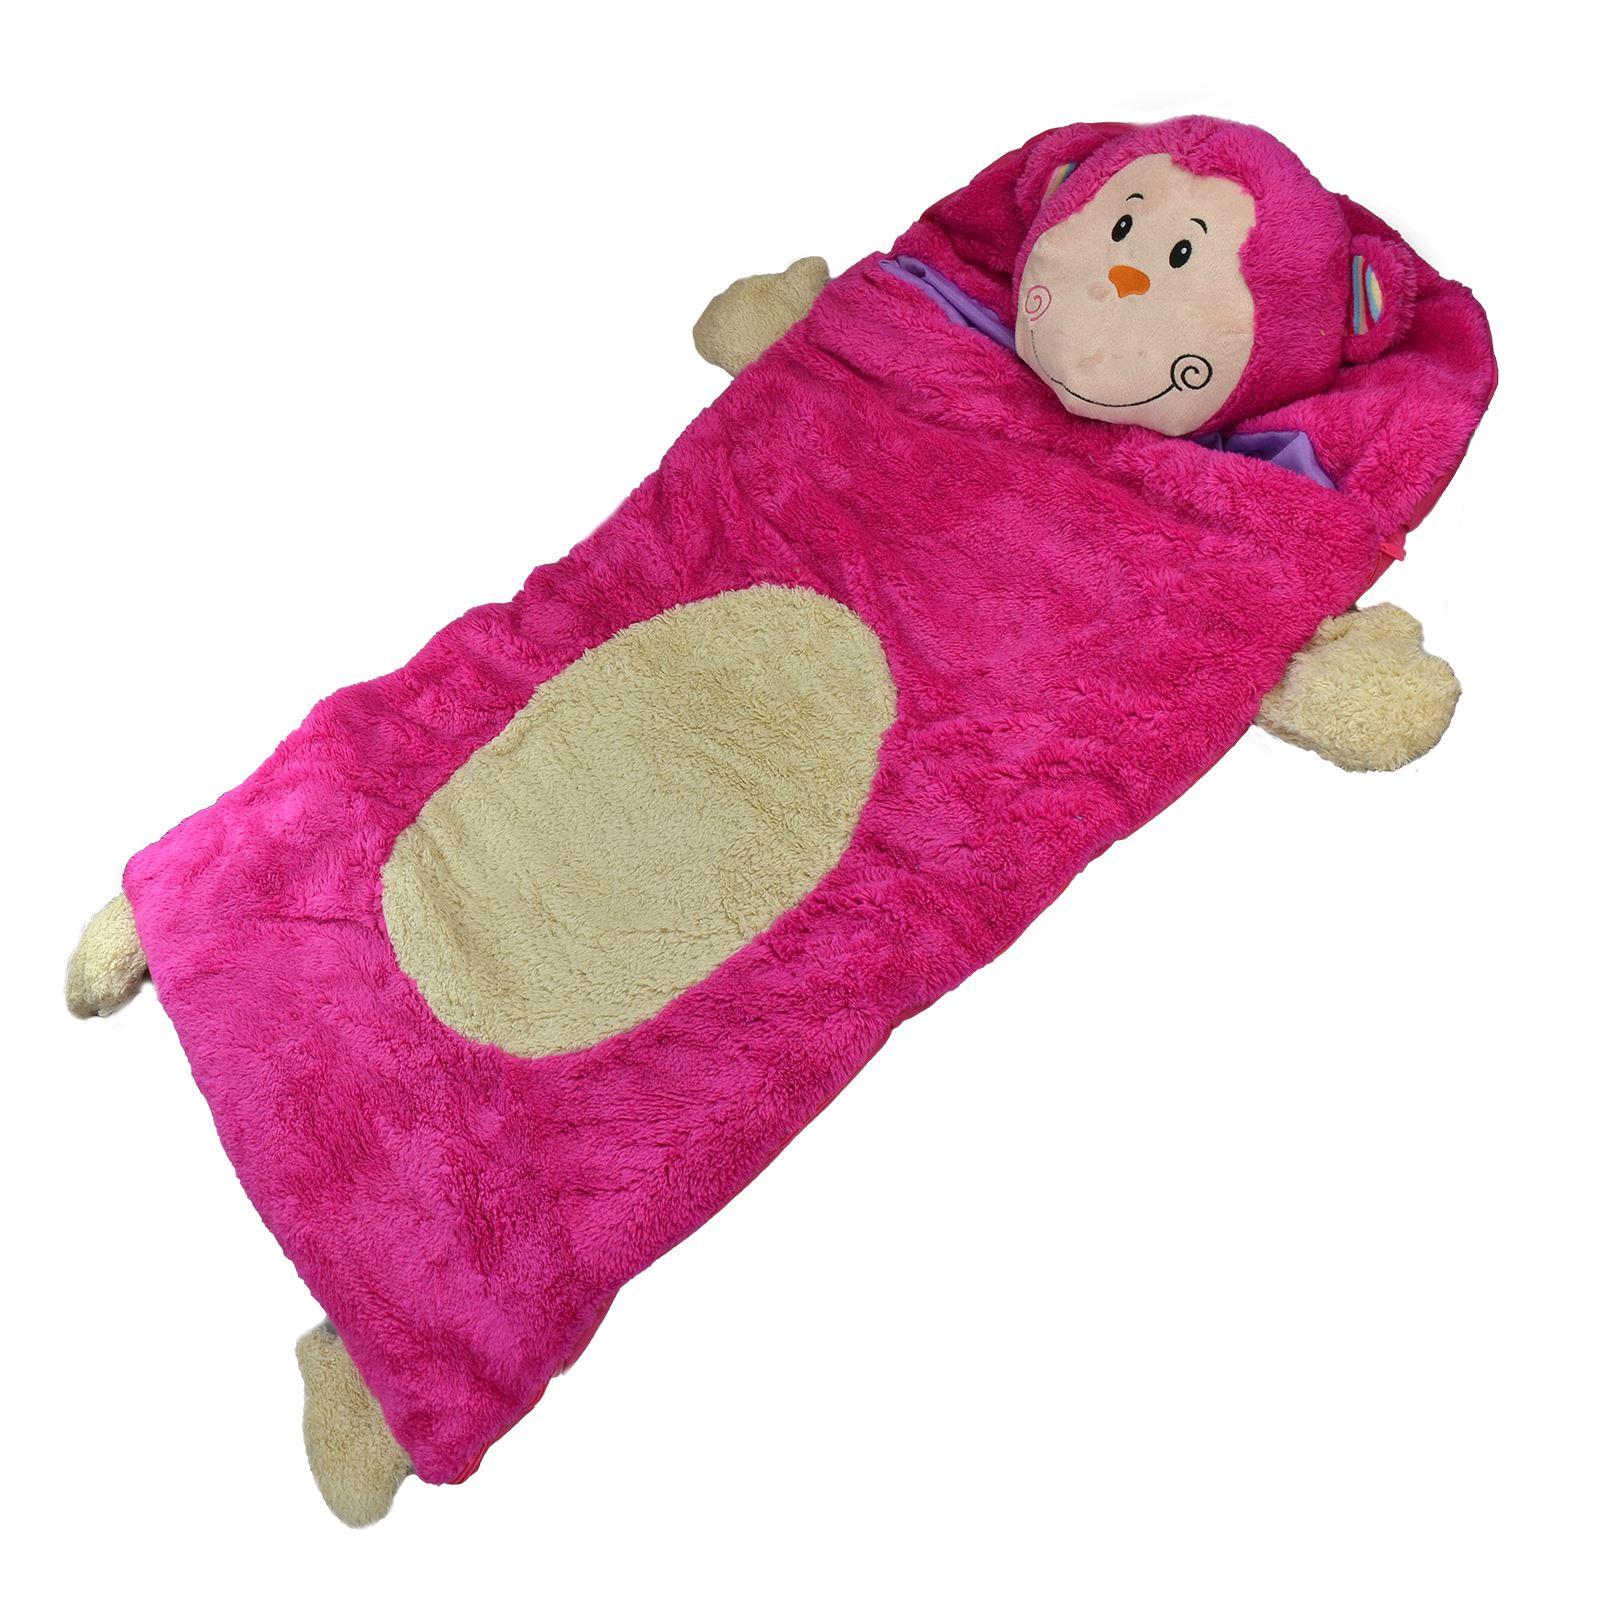 Amazing Cuddly Soft Warm Kids Animal Sleeping Bag Camping Boys Girl Sleeping Bags Personalized baby Girls Sleeping Bags